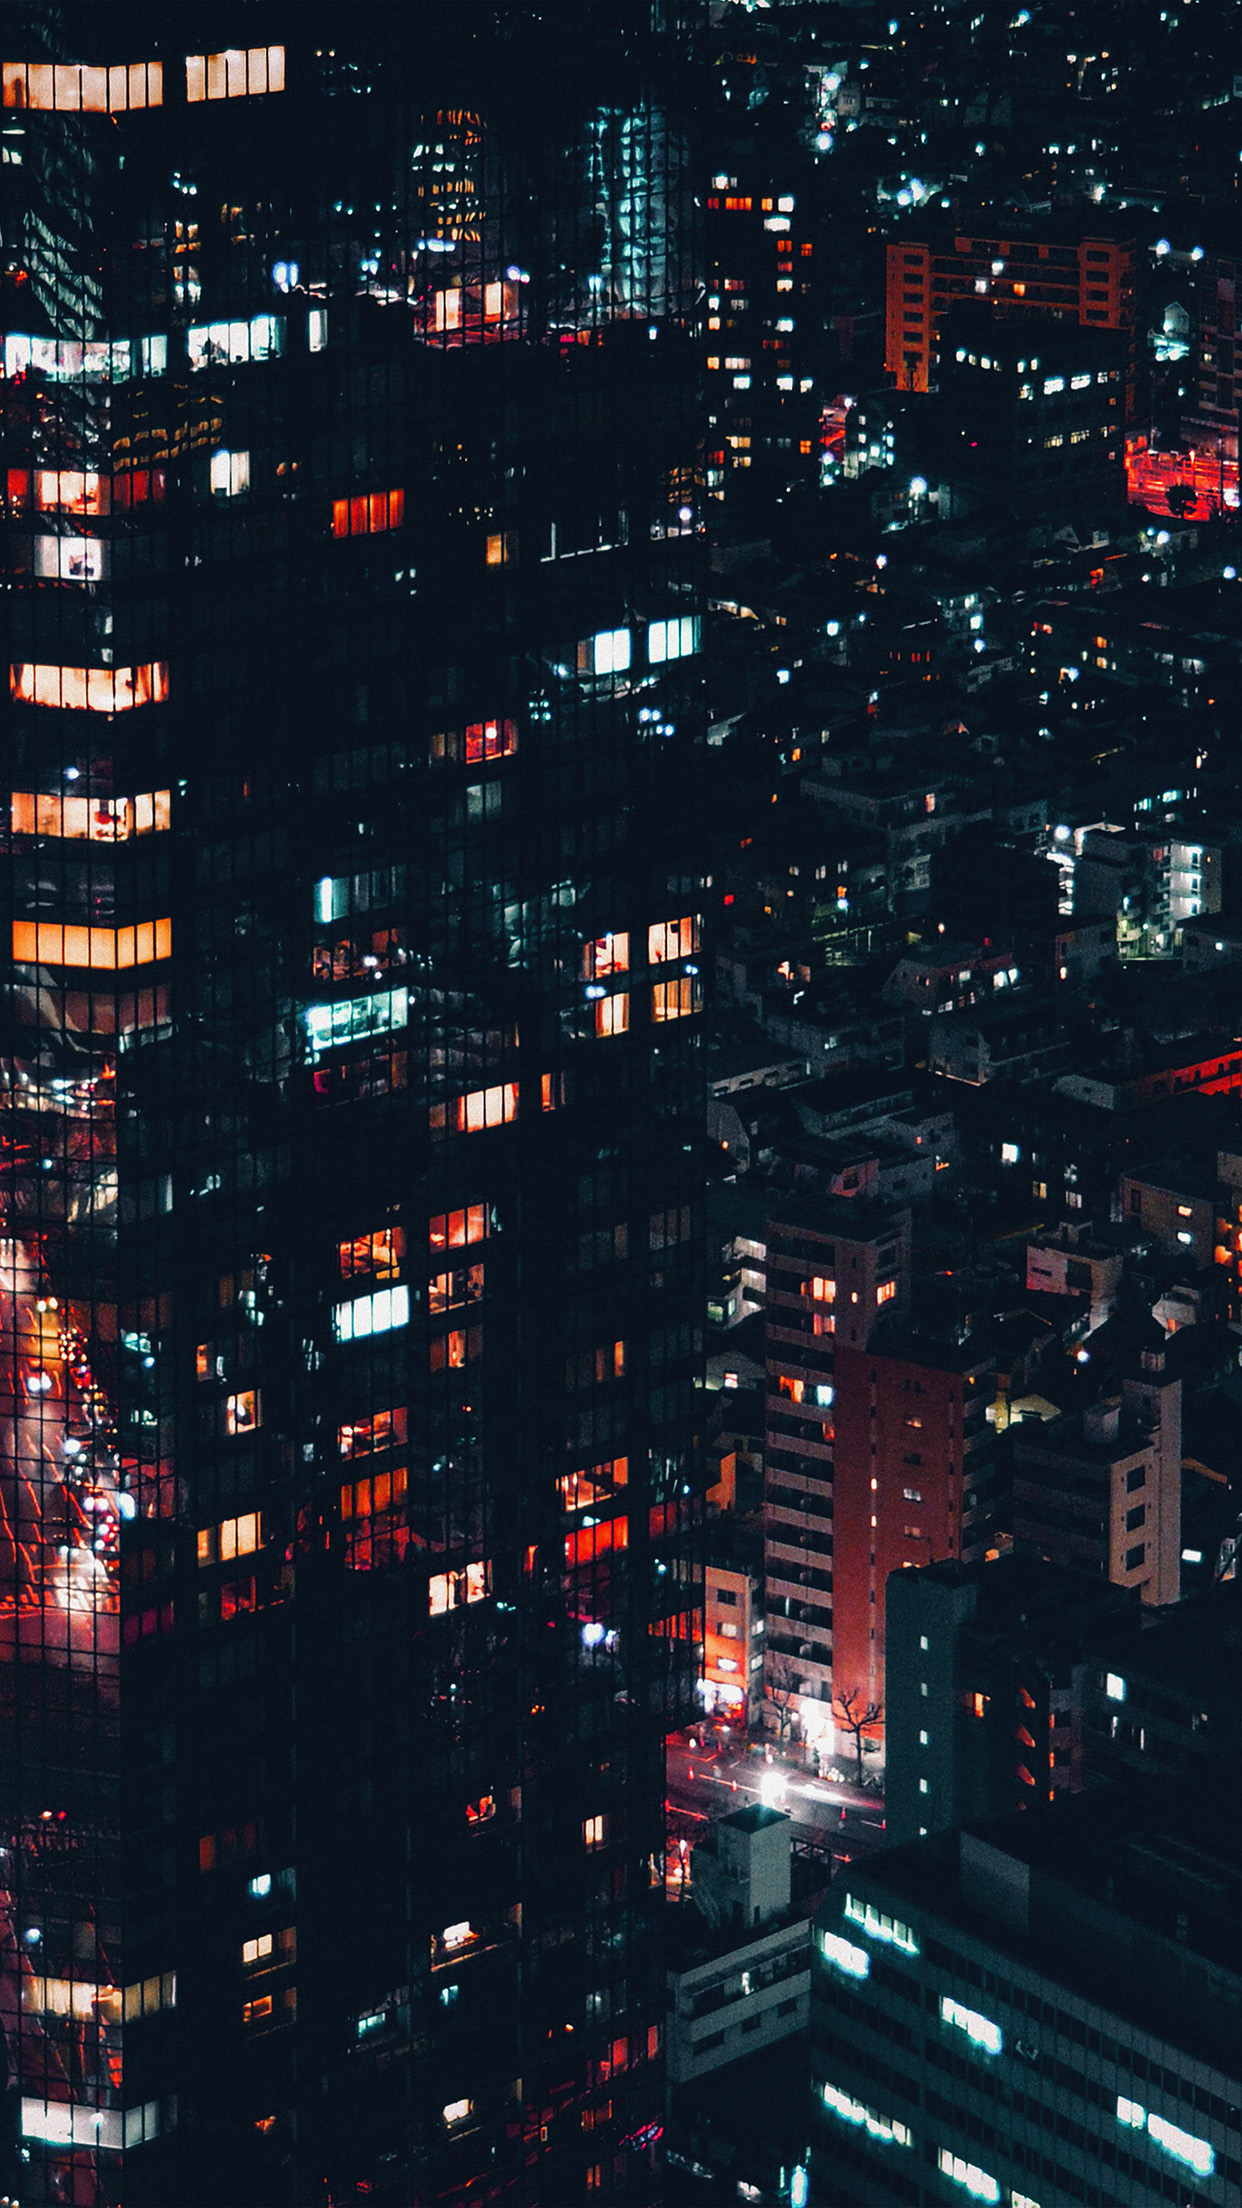 nf86-city-night-lights-building-pattern-red-wallpaper